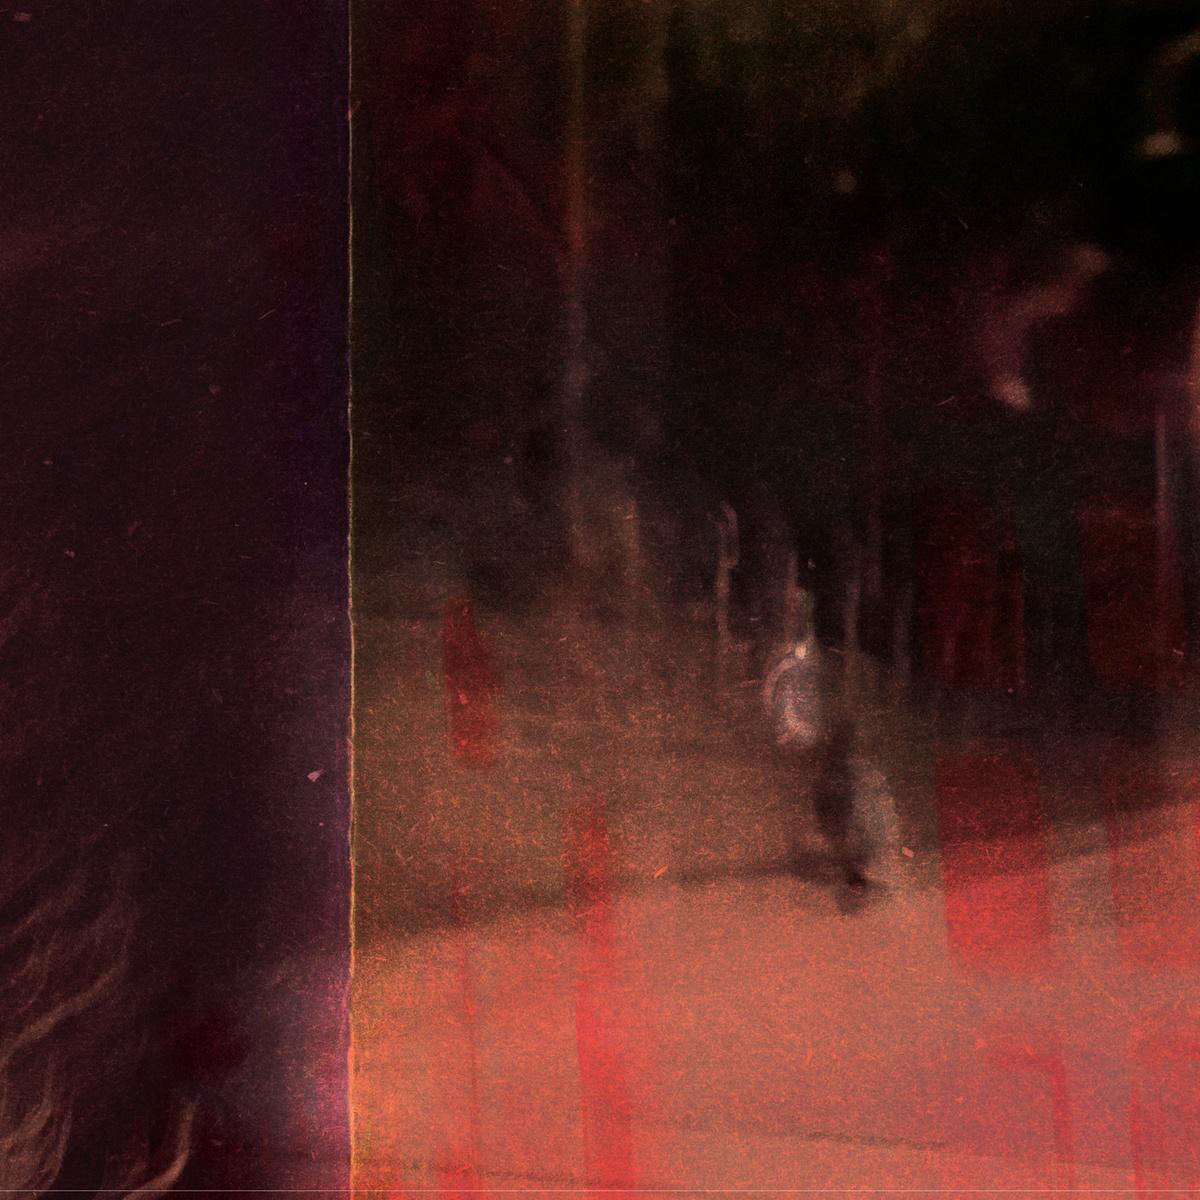 Talvihorros - Eaten Alive - 2014